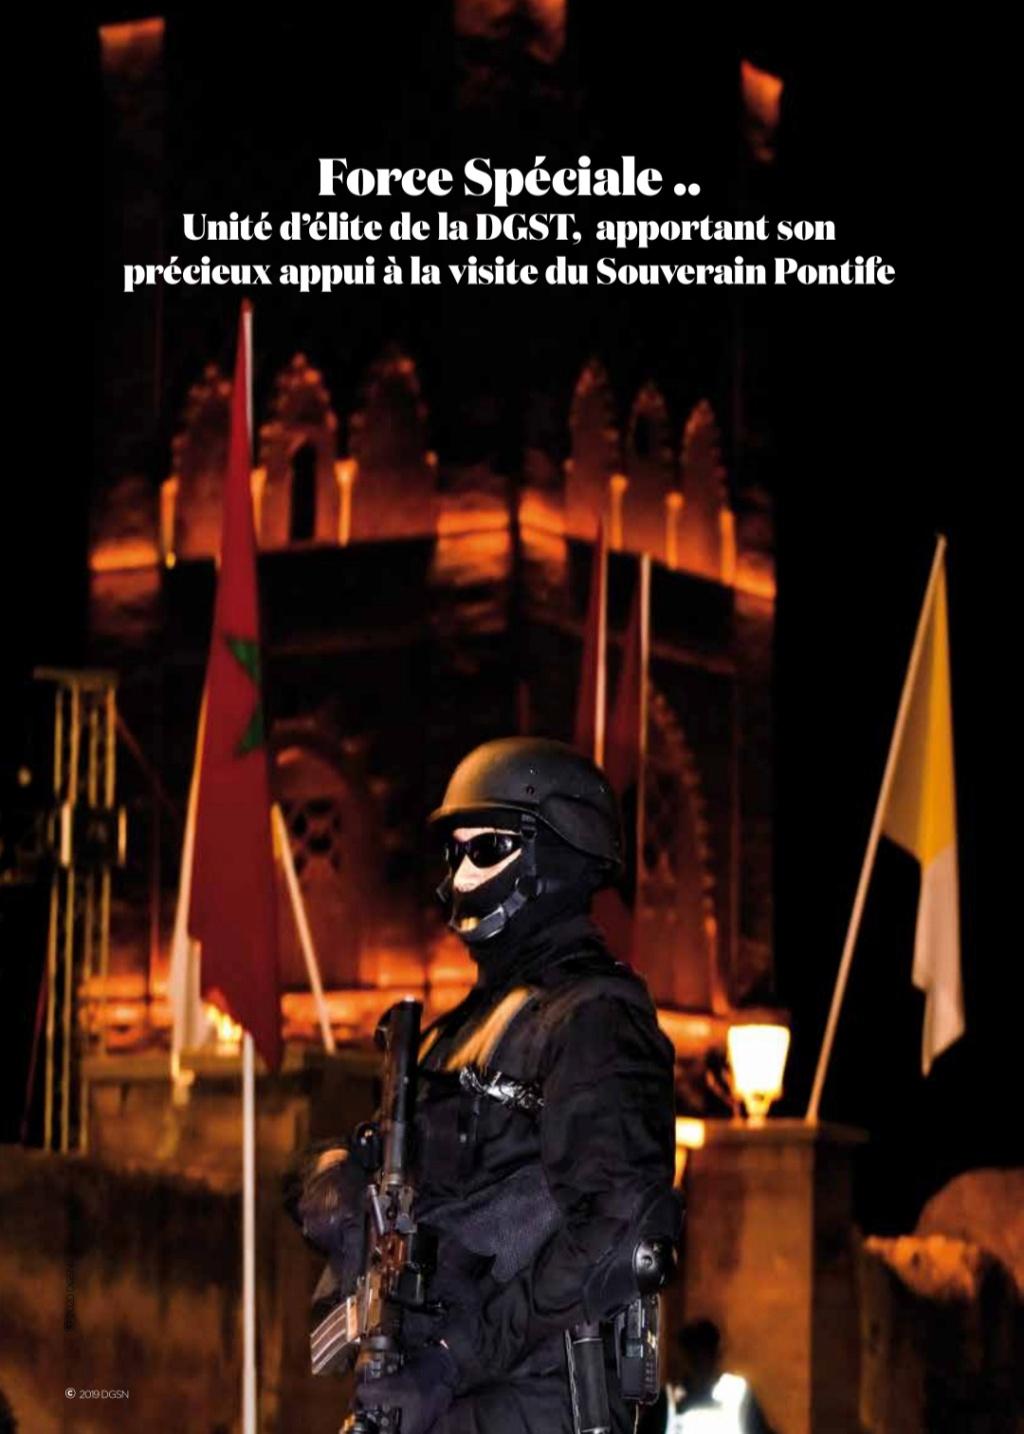 Moroccan Special Forces/Forces spéciales marocaines  :Videos et Photos : BCIJ, Gendarmerie Royale ,  - Page 20 Scree203